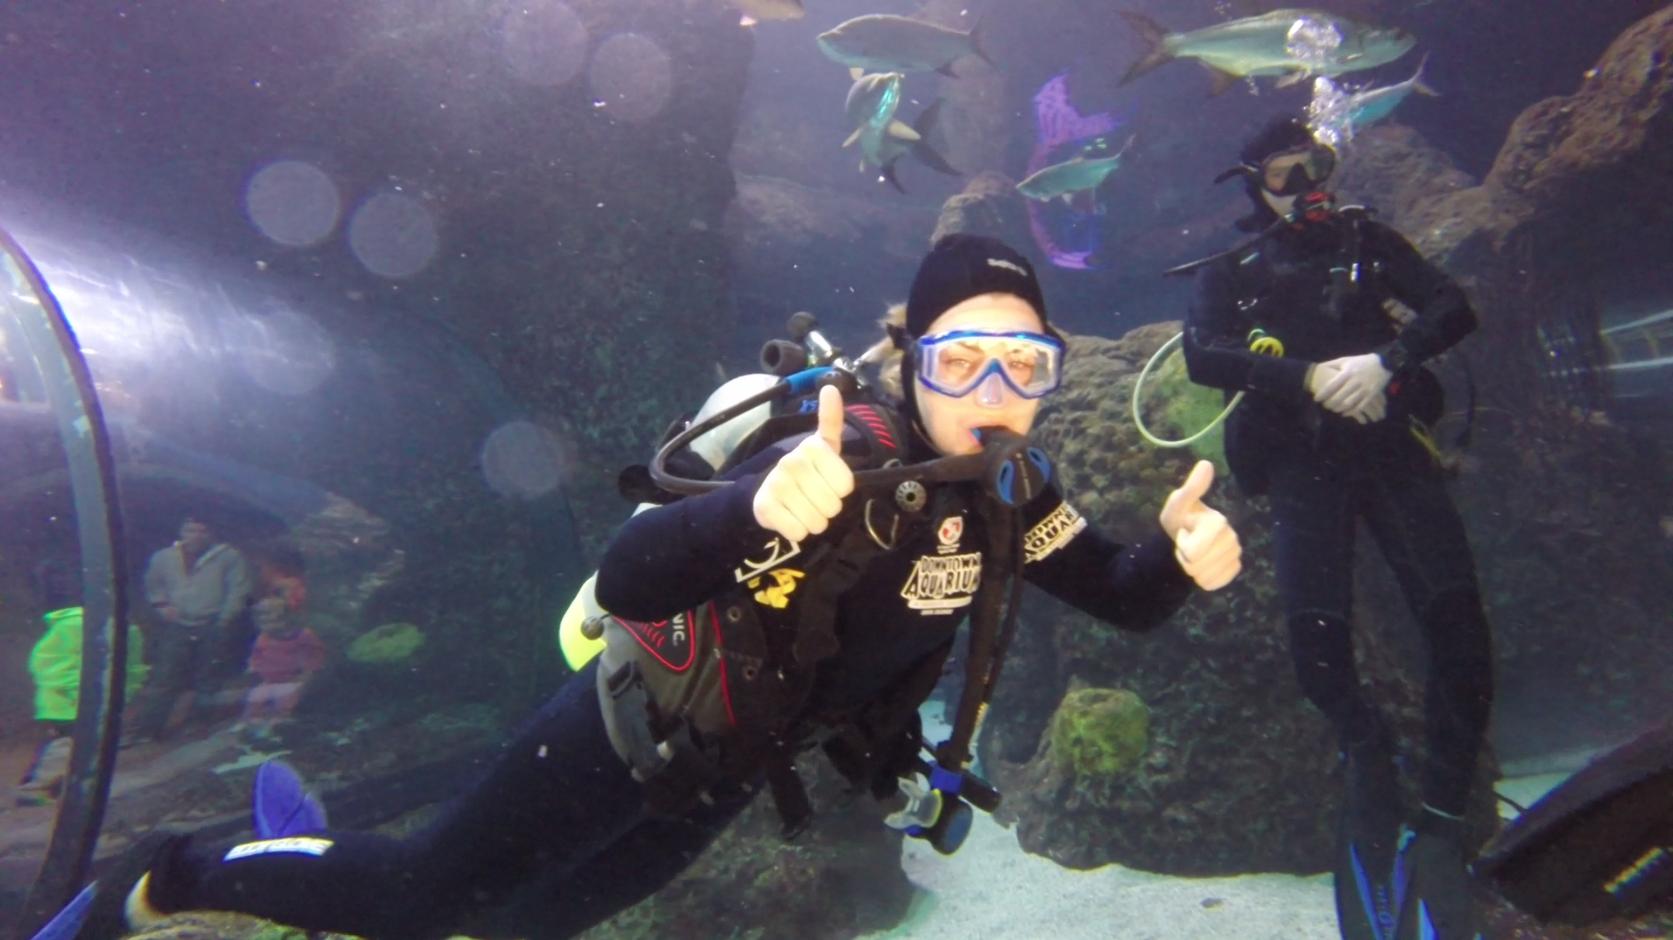 Snorkeling Scuba Diving At The Downtown Aquarium Denver